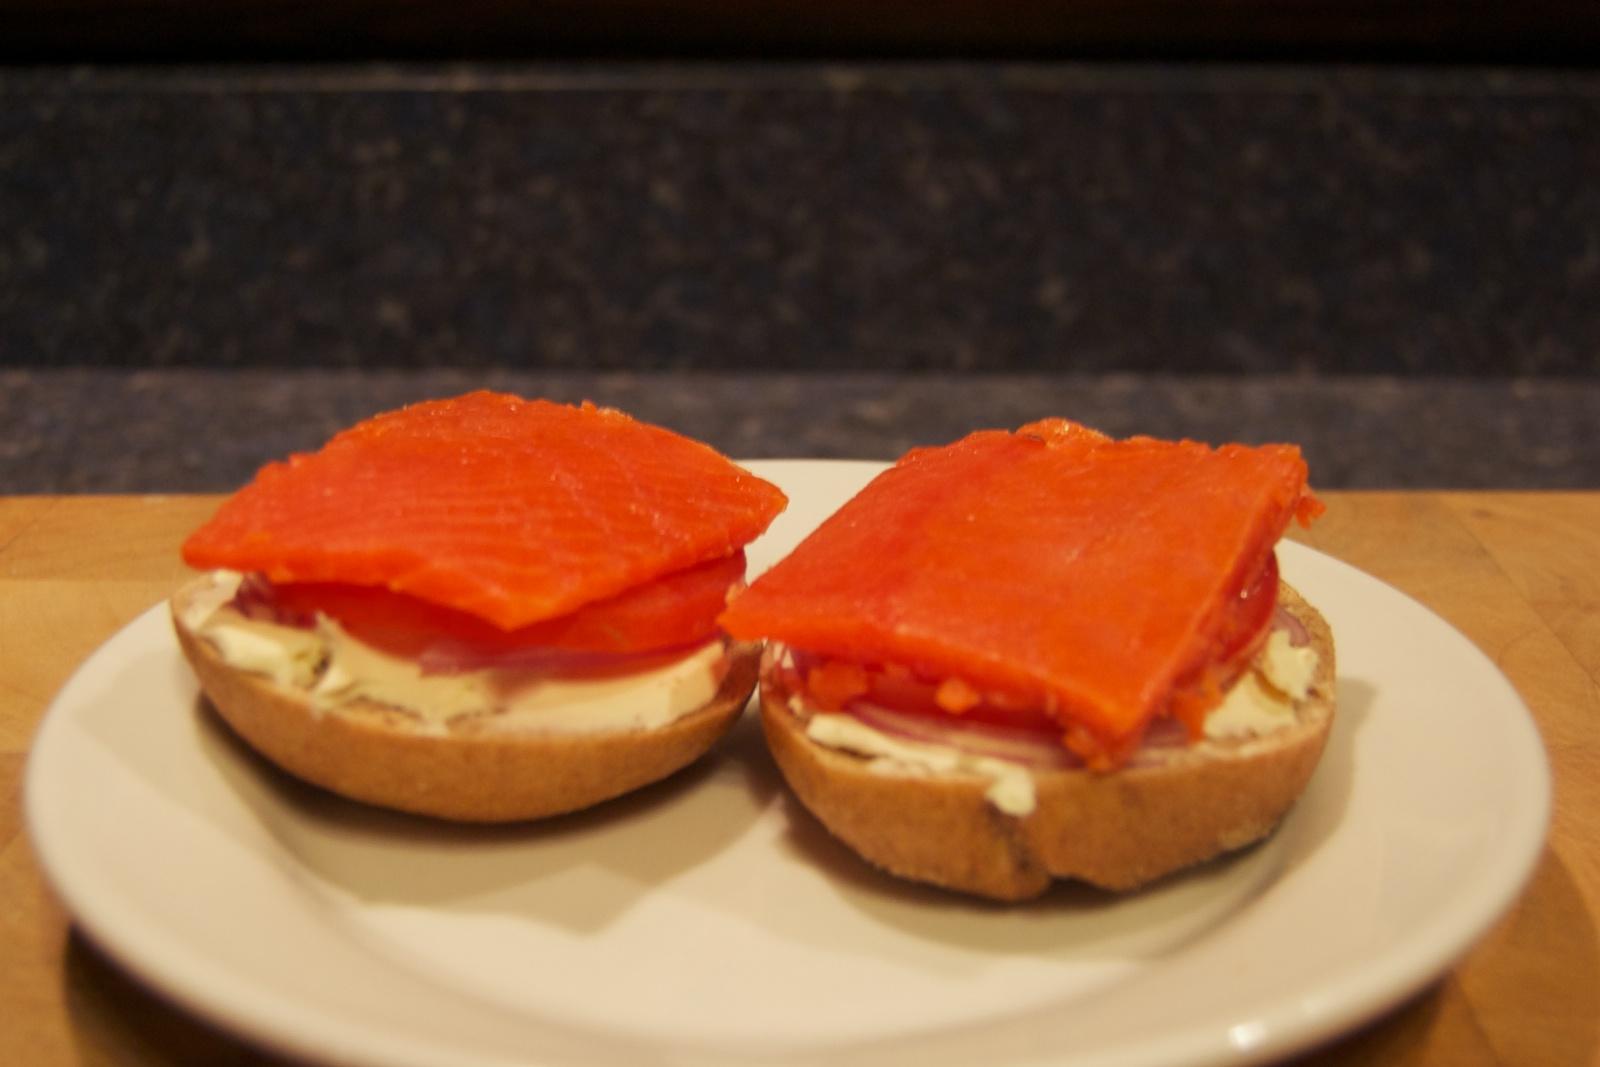 http://blog.rickk.com/food/2013/01/13/ate.2013.01.13.b.jpg